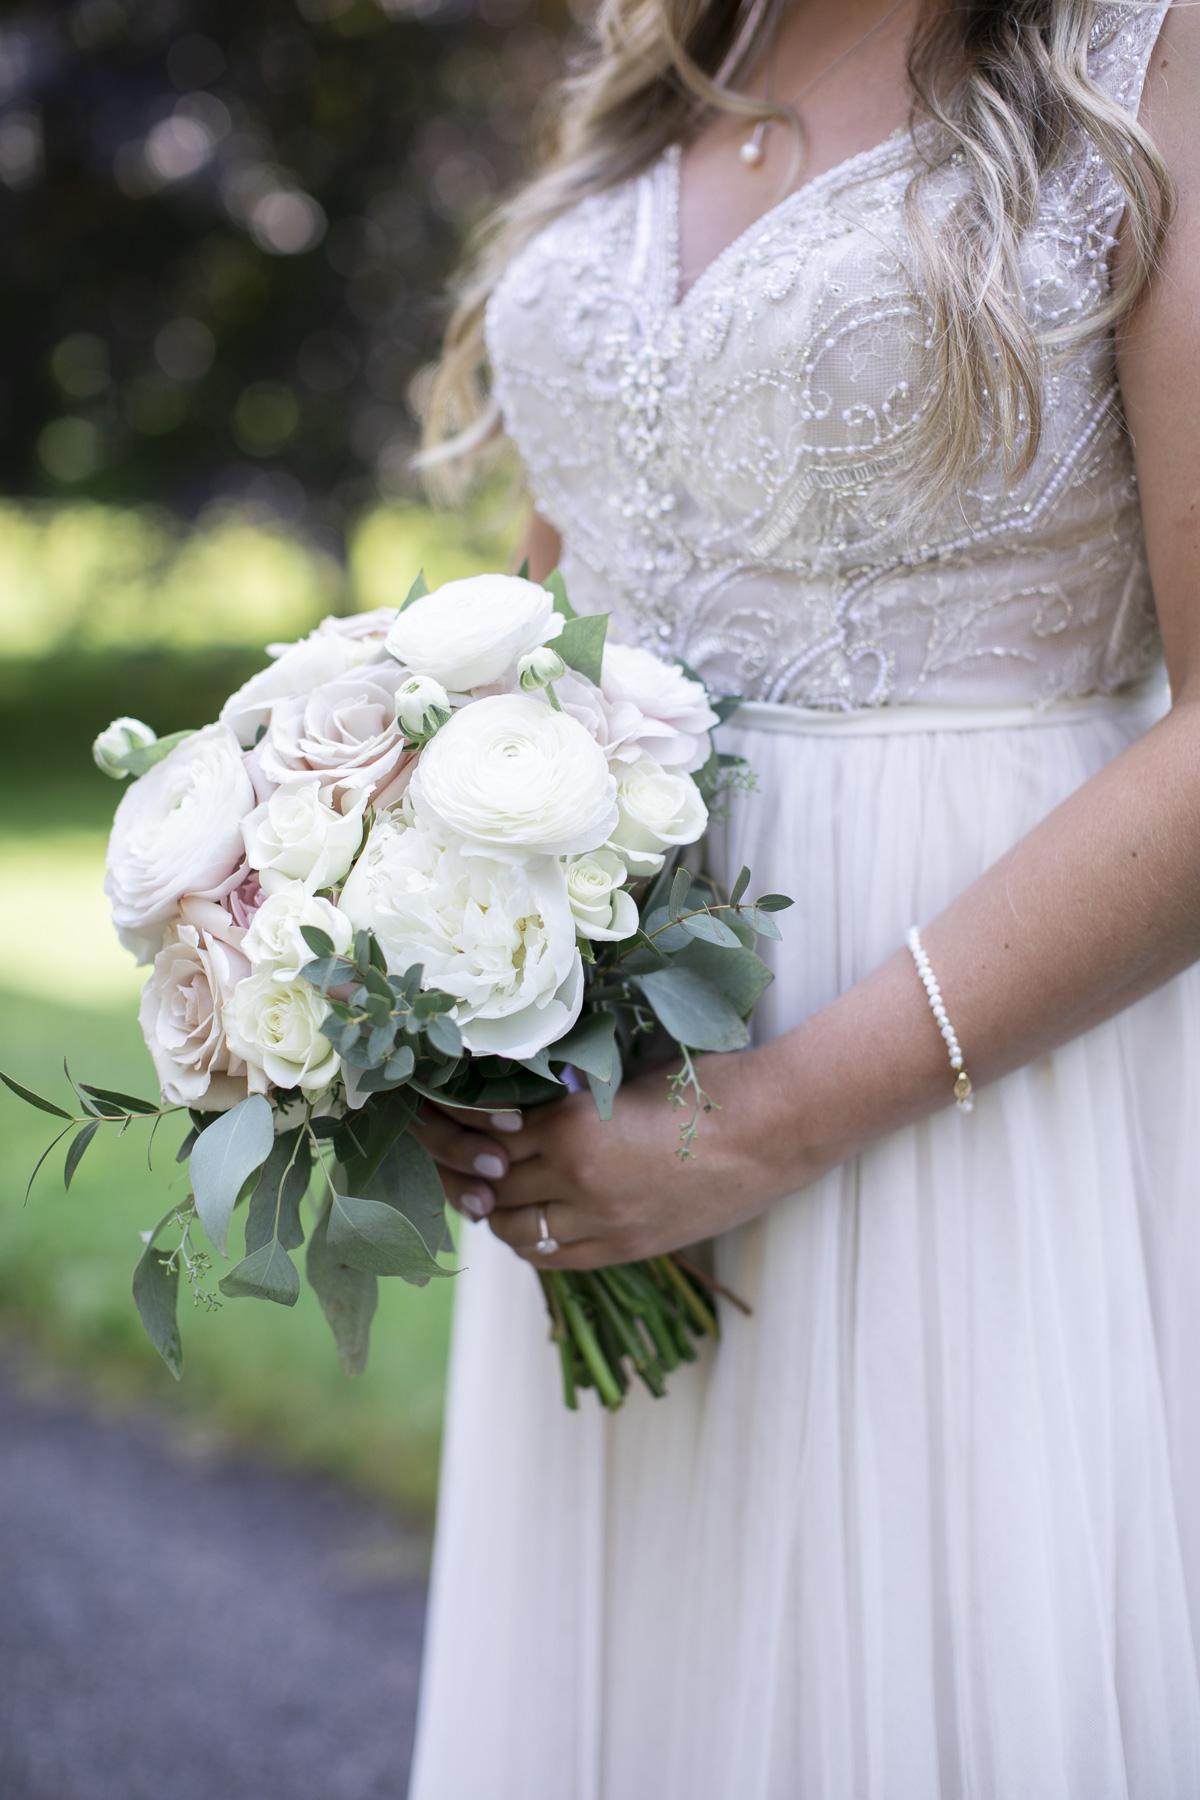 vineyard-bride-philosophy-studios-outdoor-summer-wedding-the-tamahaac-club-niagara-ancaster-toronto-vendor-0052.JPG